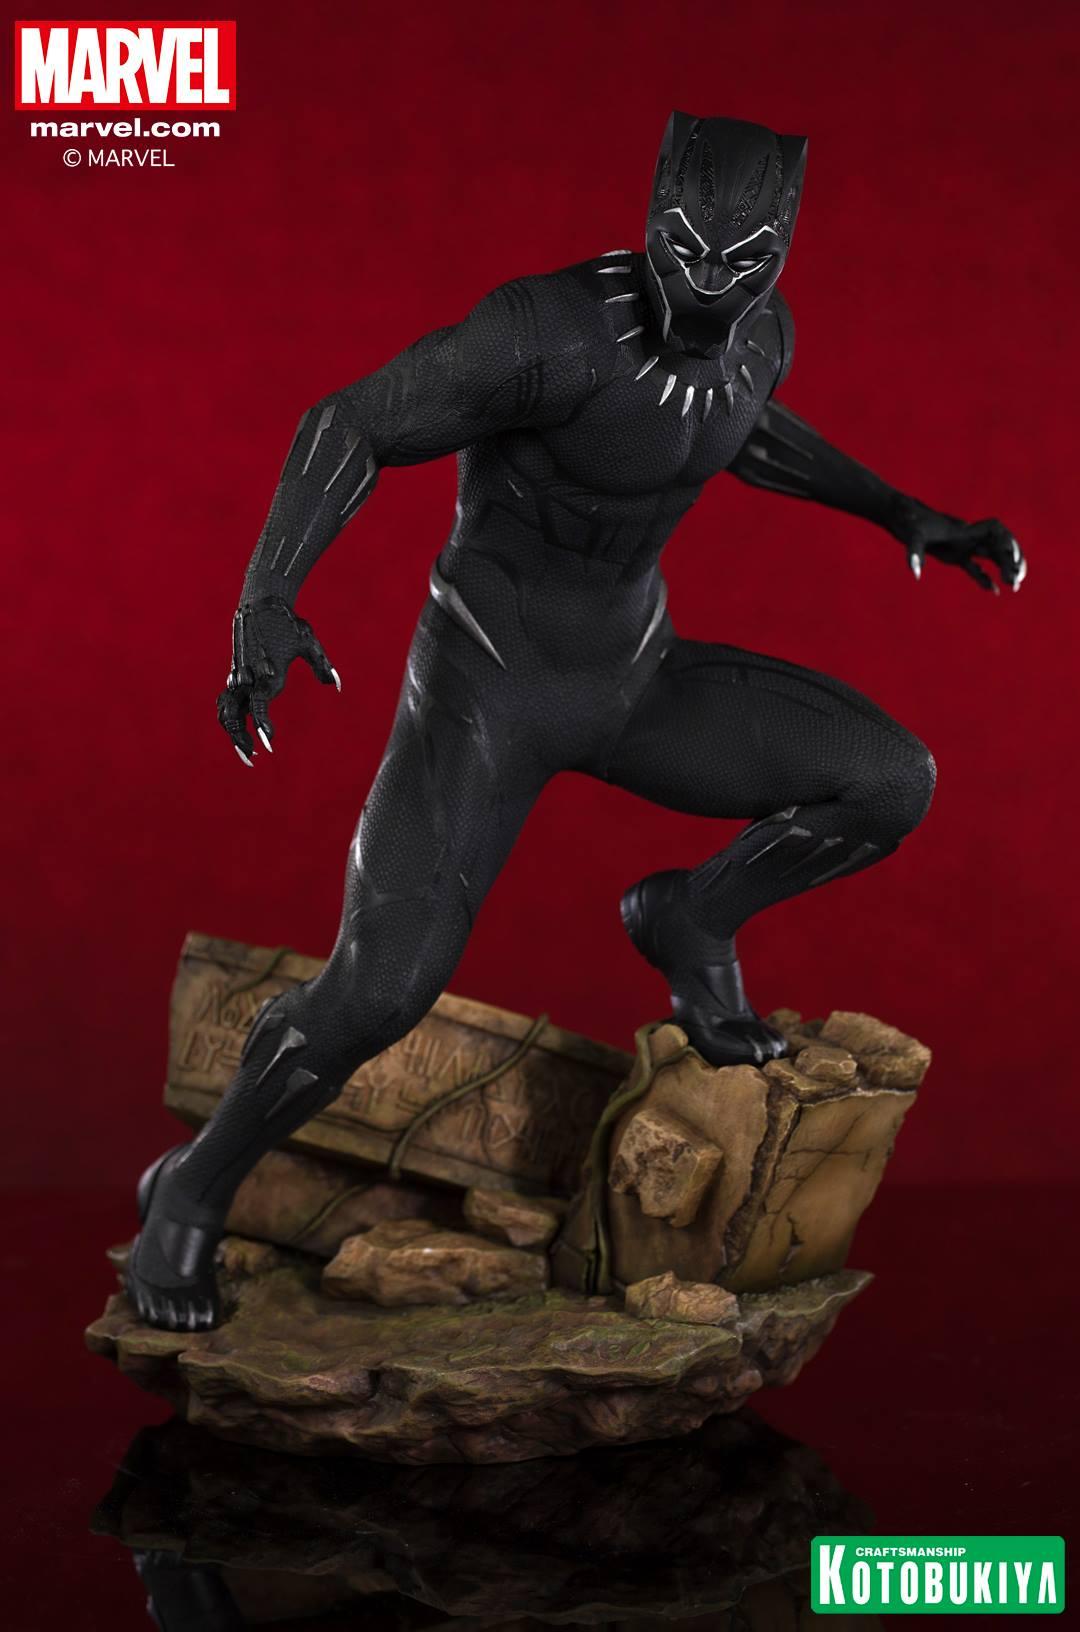 Koto-Black-Panther-Movie-Statue-002